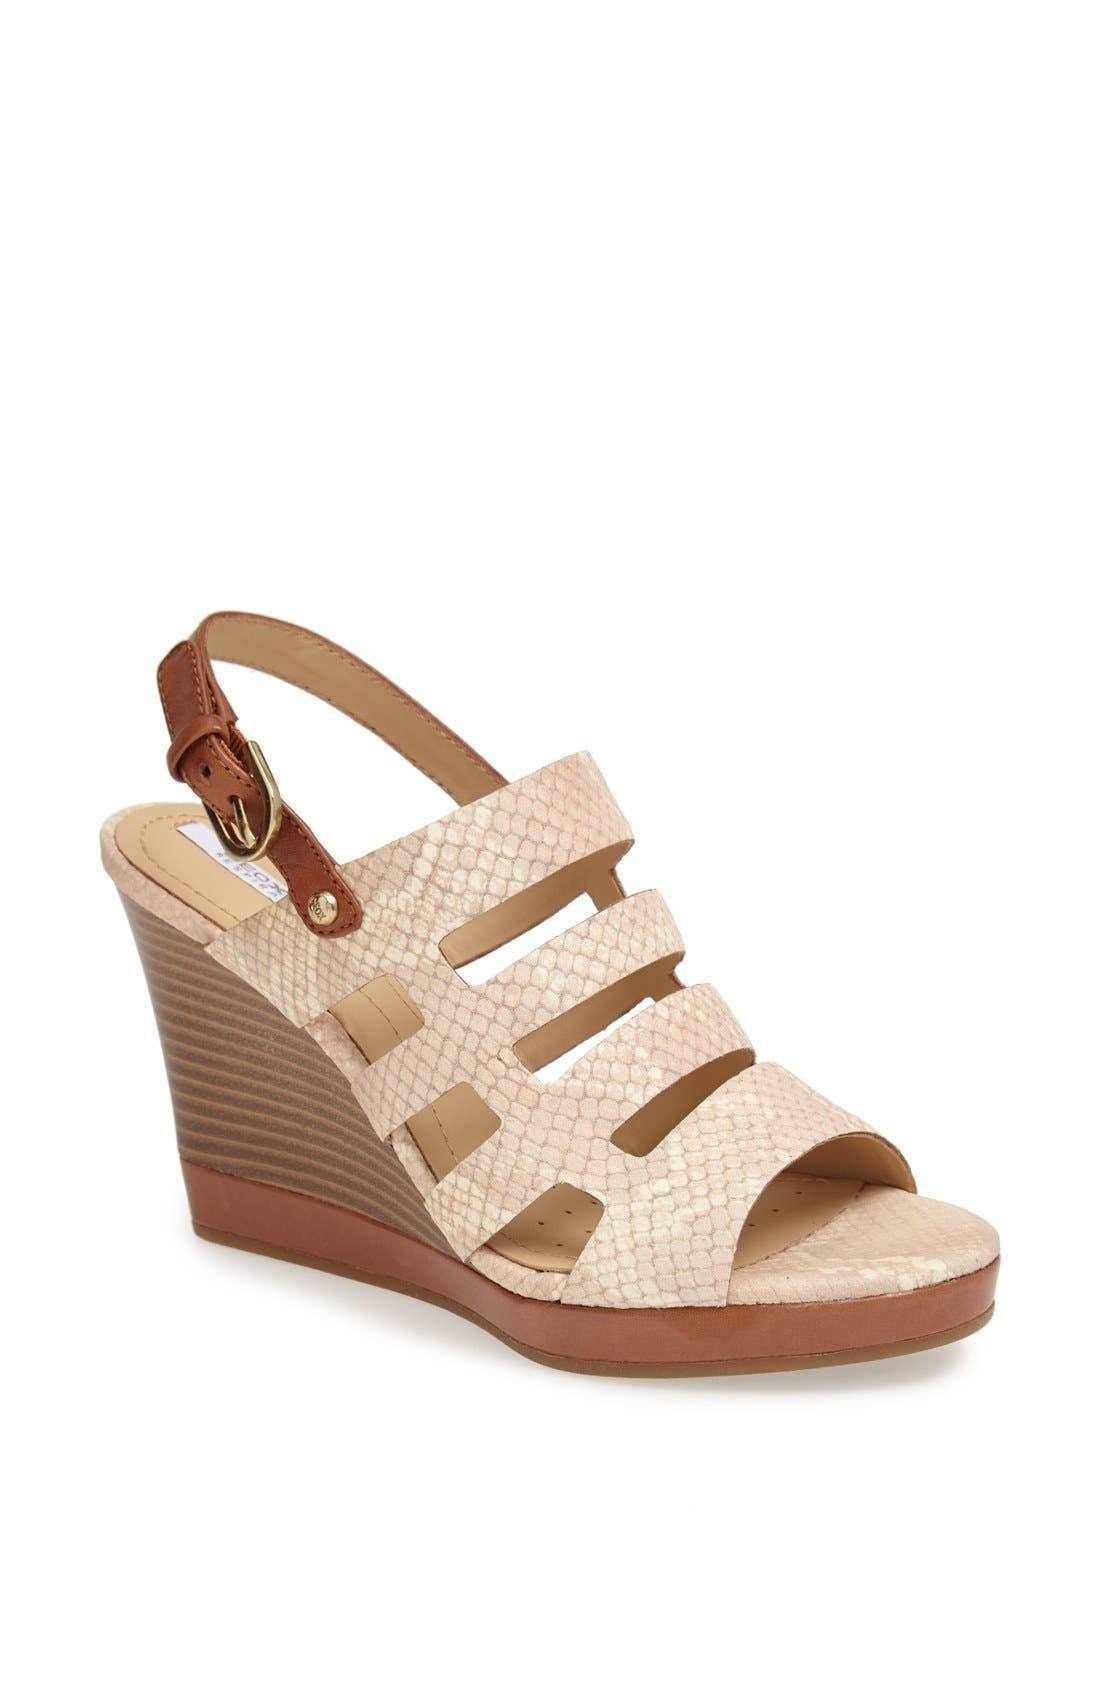 Main Image - Geox 'Sibilla' Wedge Sandal